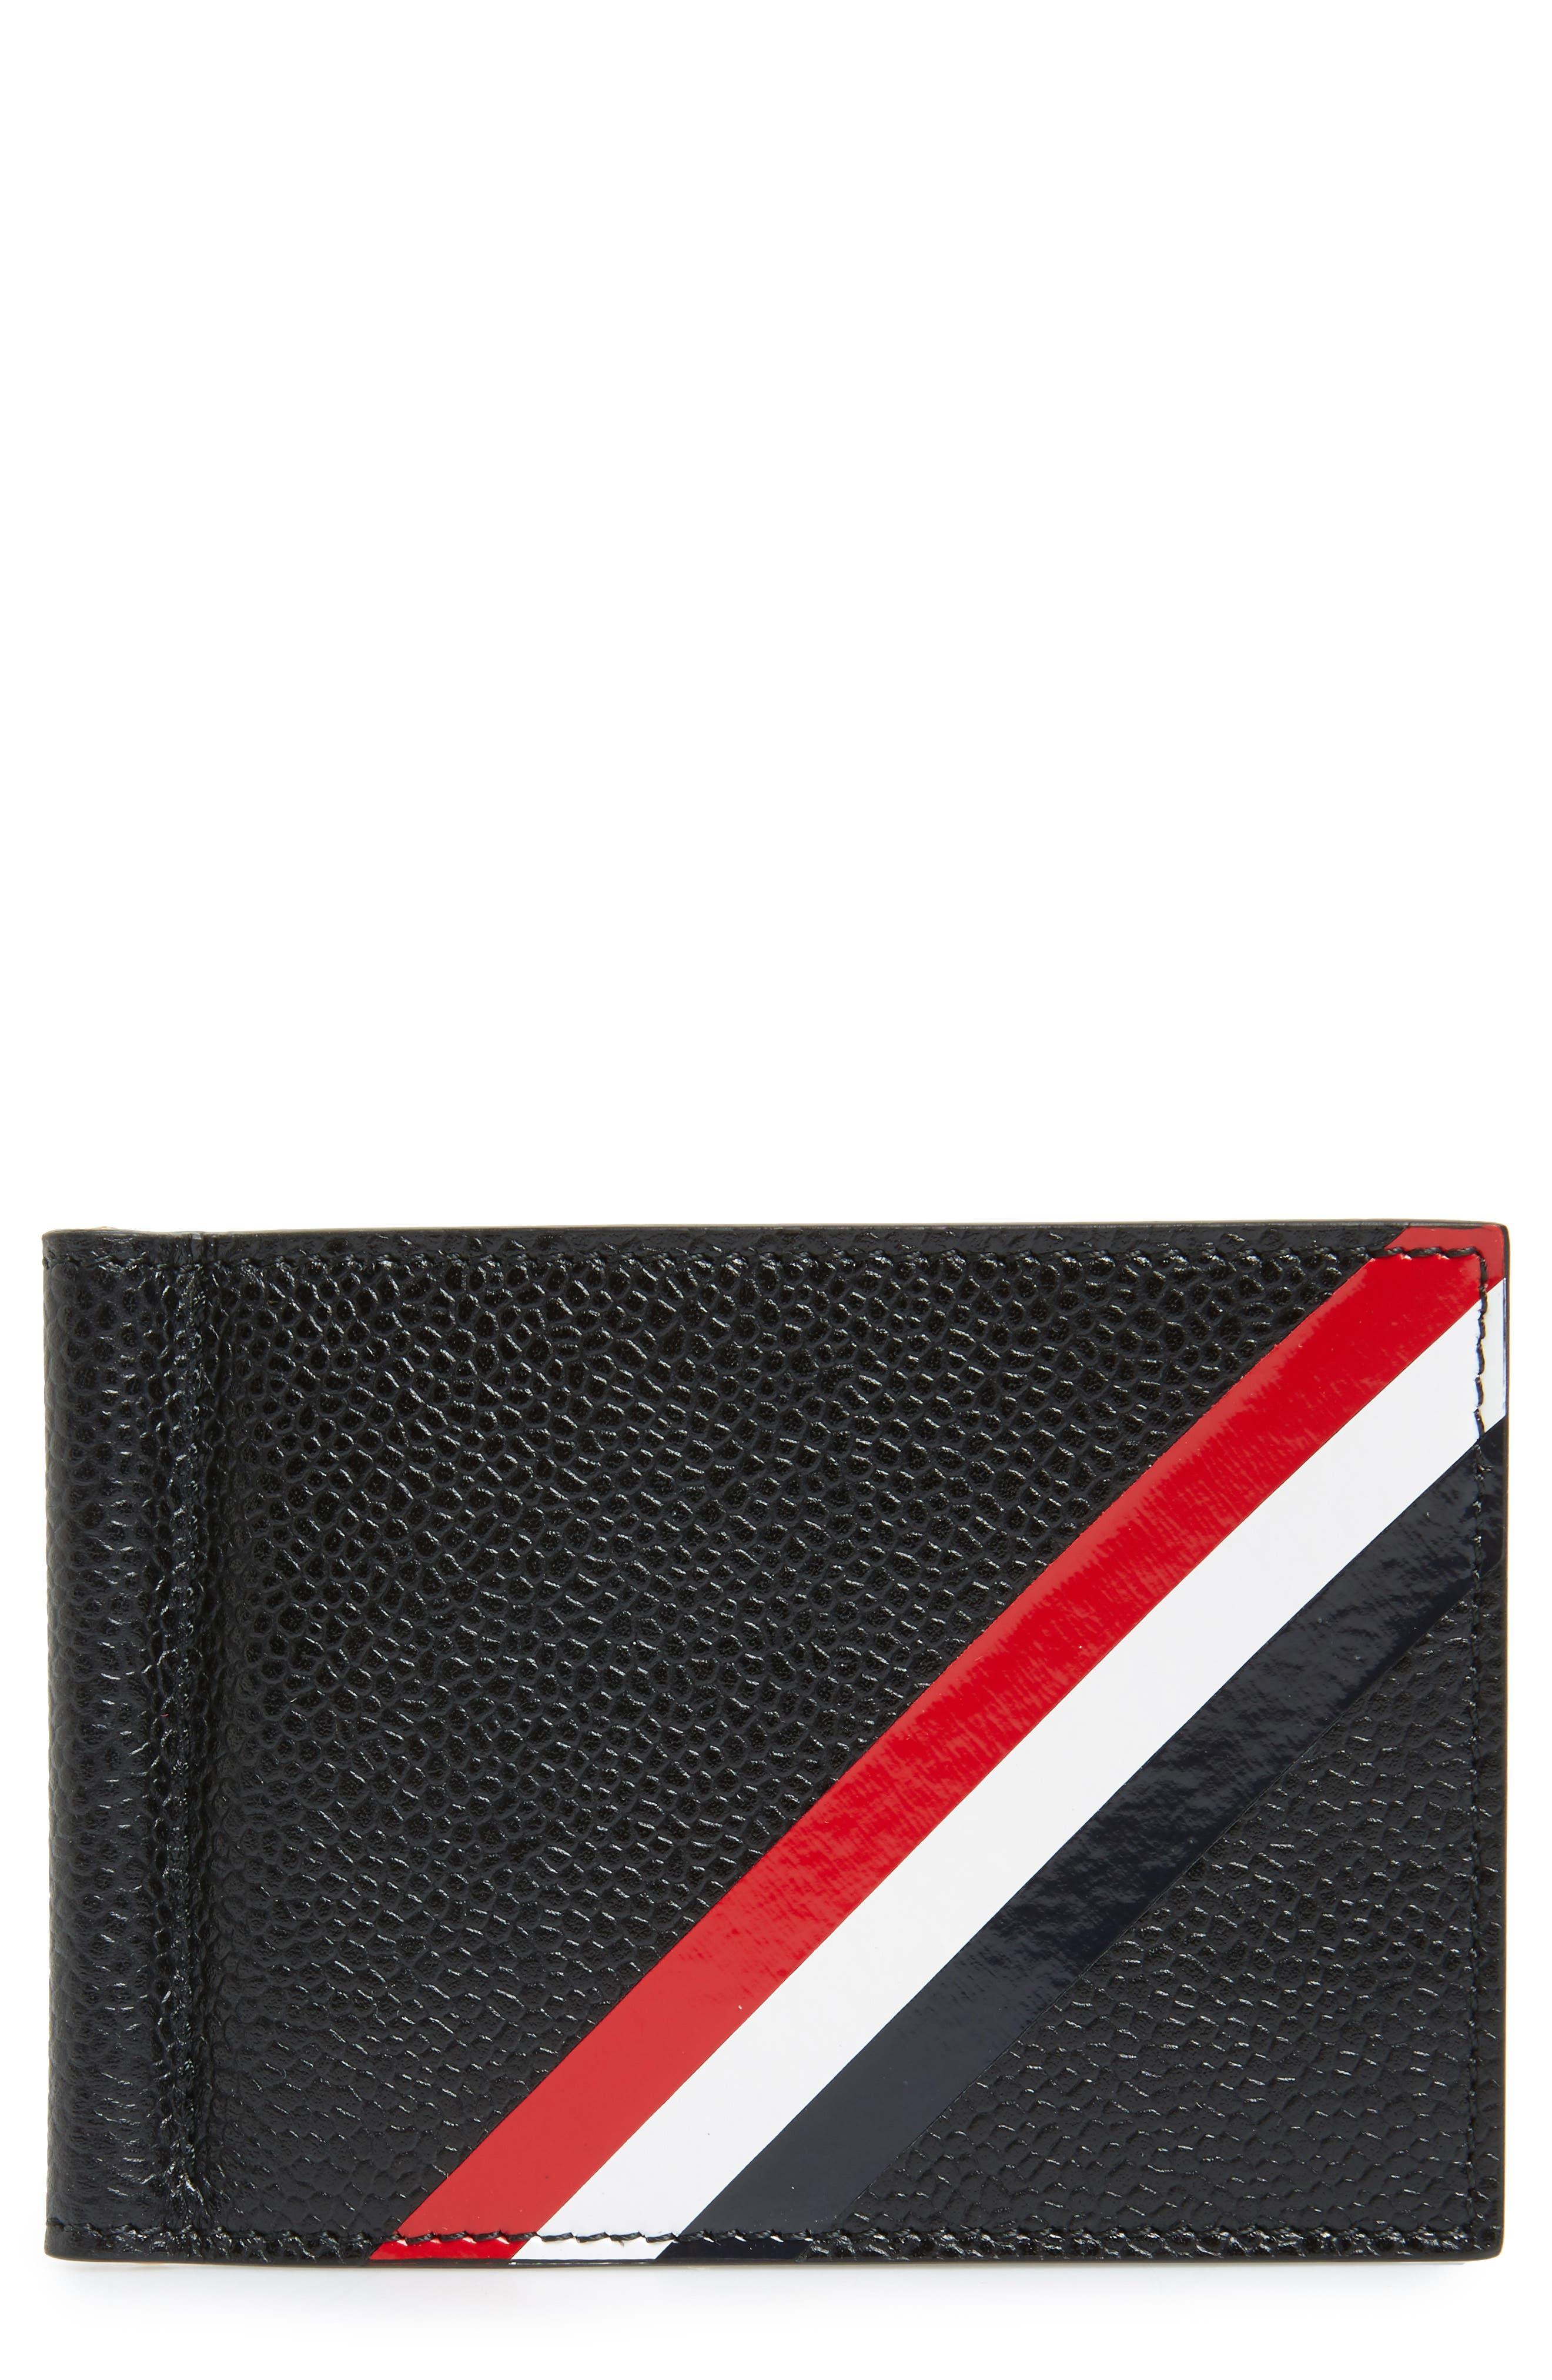 Main Image - Thom Browne Diagonal Stripe Leather Card Holder